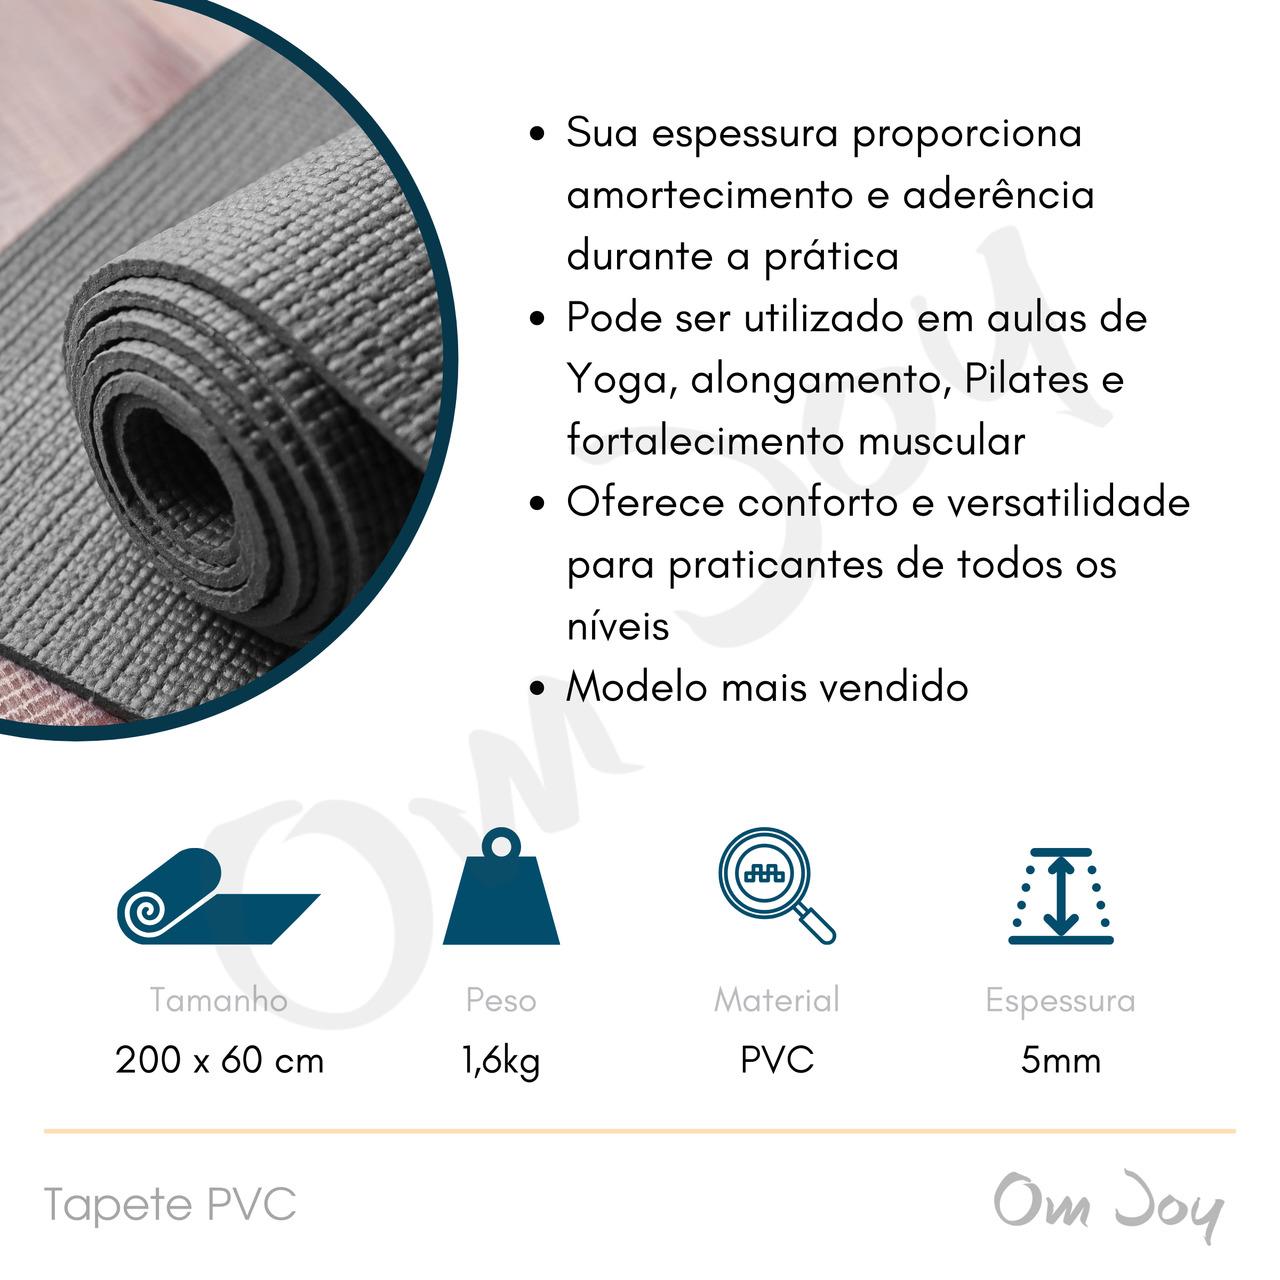 Tapete Premium de Yoga / Pilates - PVC - 200x60cm